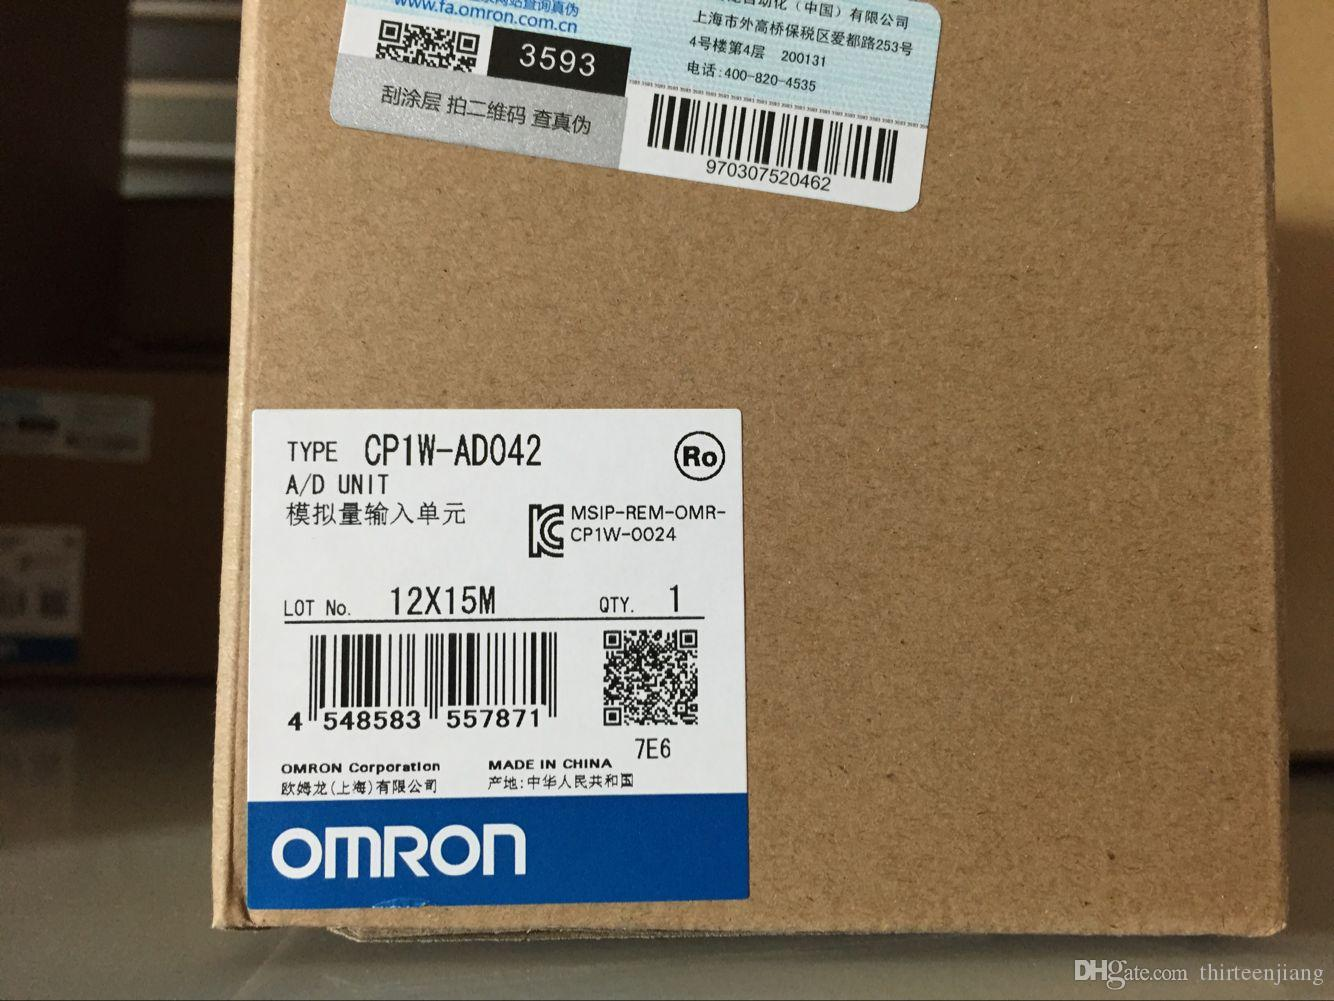 OMRON PLC CP1W-AD042 FRETE GRÁTIS EXPEDIDA CP1WAD042 NOVO NA CAIXA